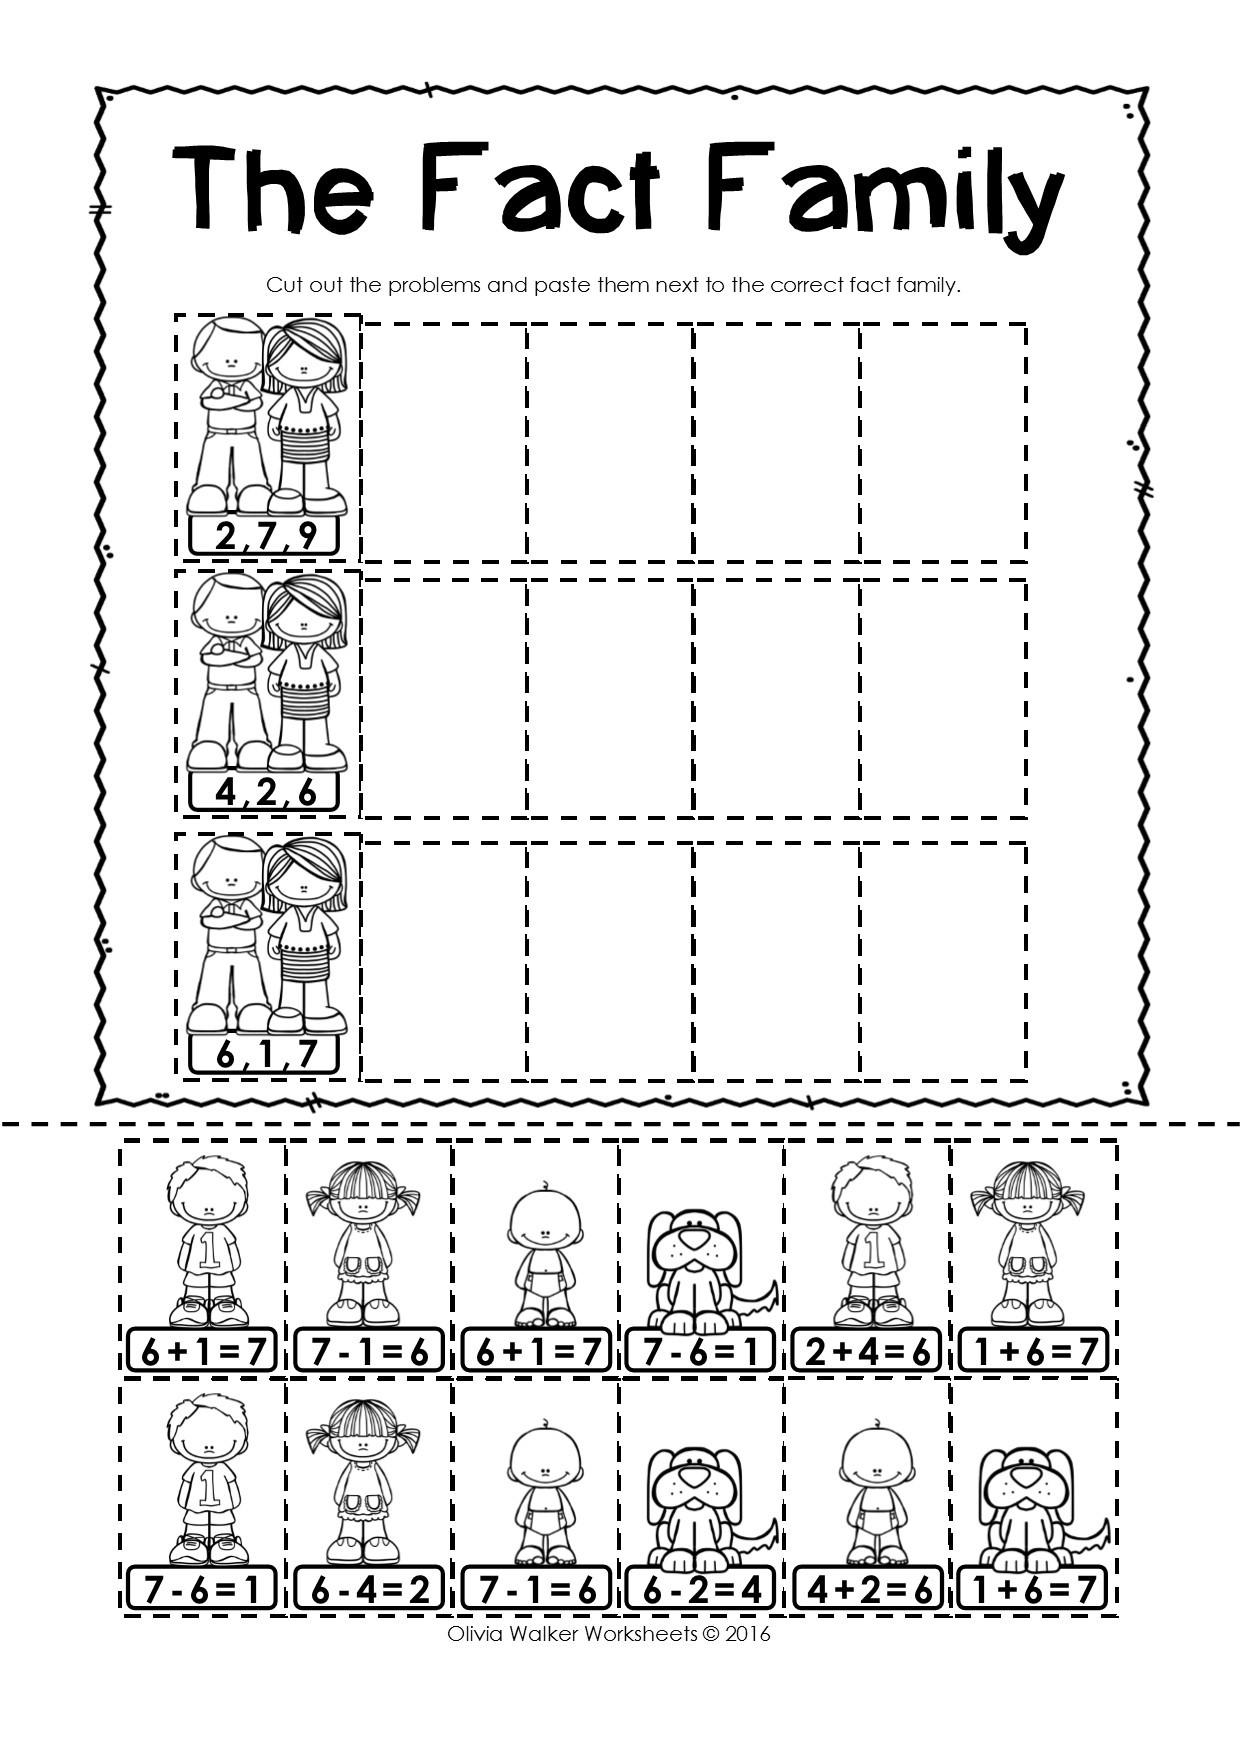 Word Family Worksheet Kindergarten Worksheet Munity Workers Right Age for